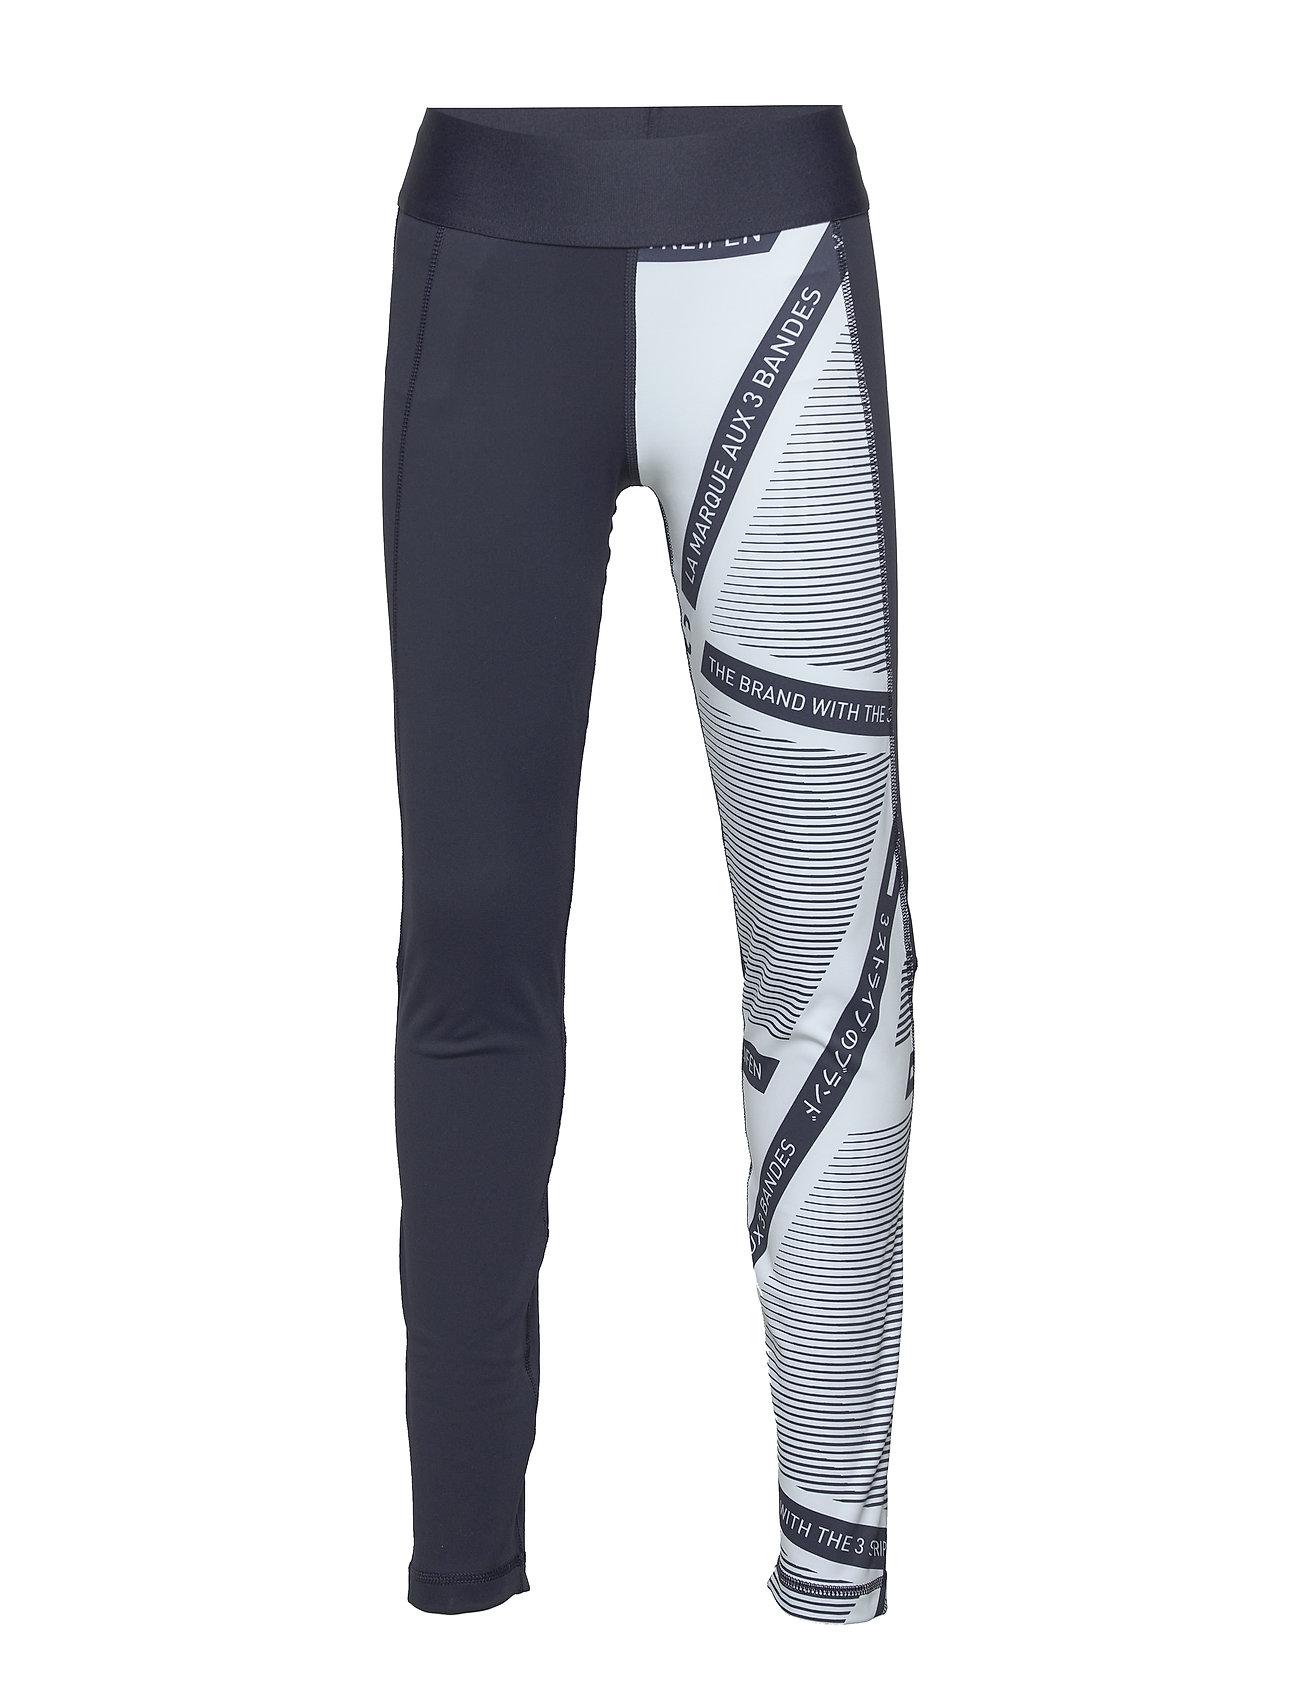 Image of Jg Tr Ask Tight Leggings Grå Adidas Performance (3408582597)